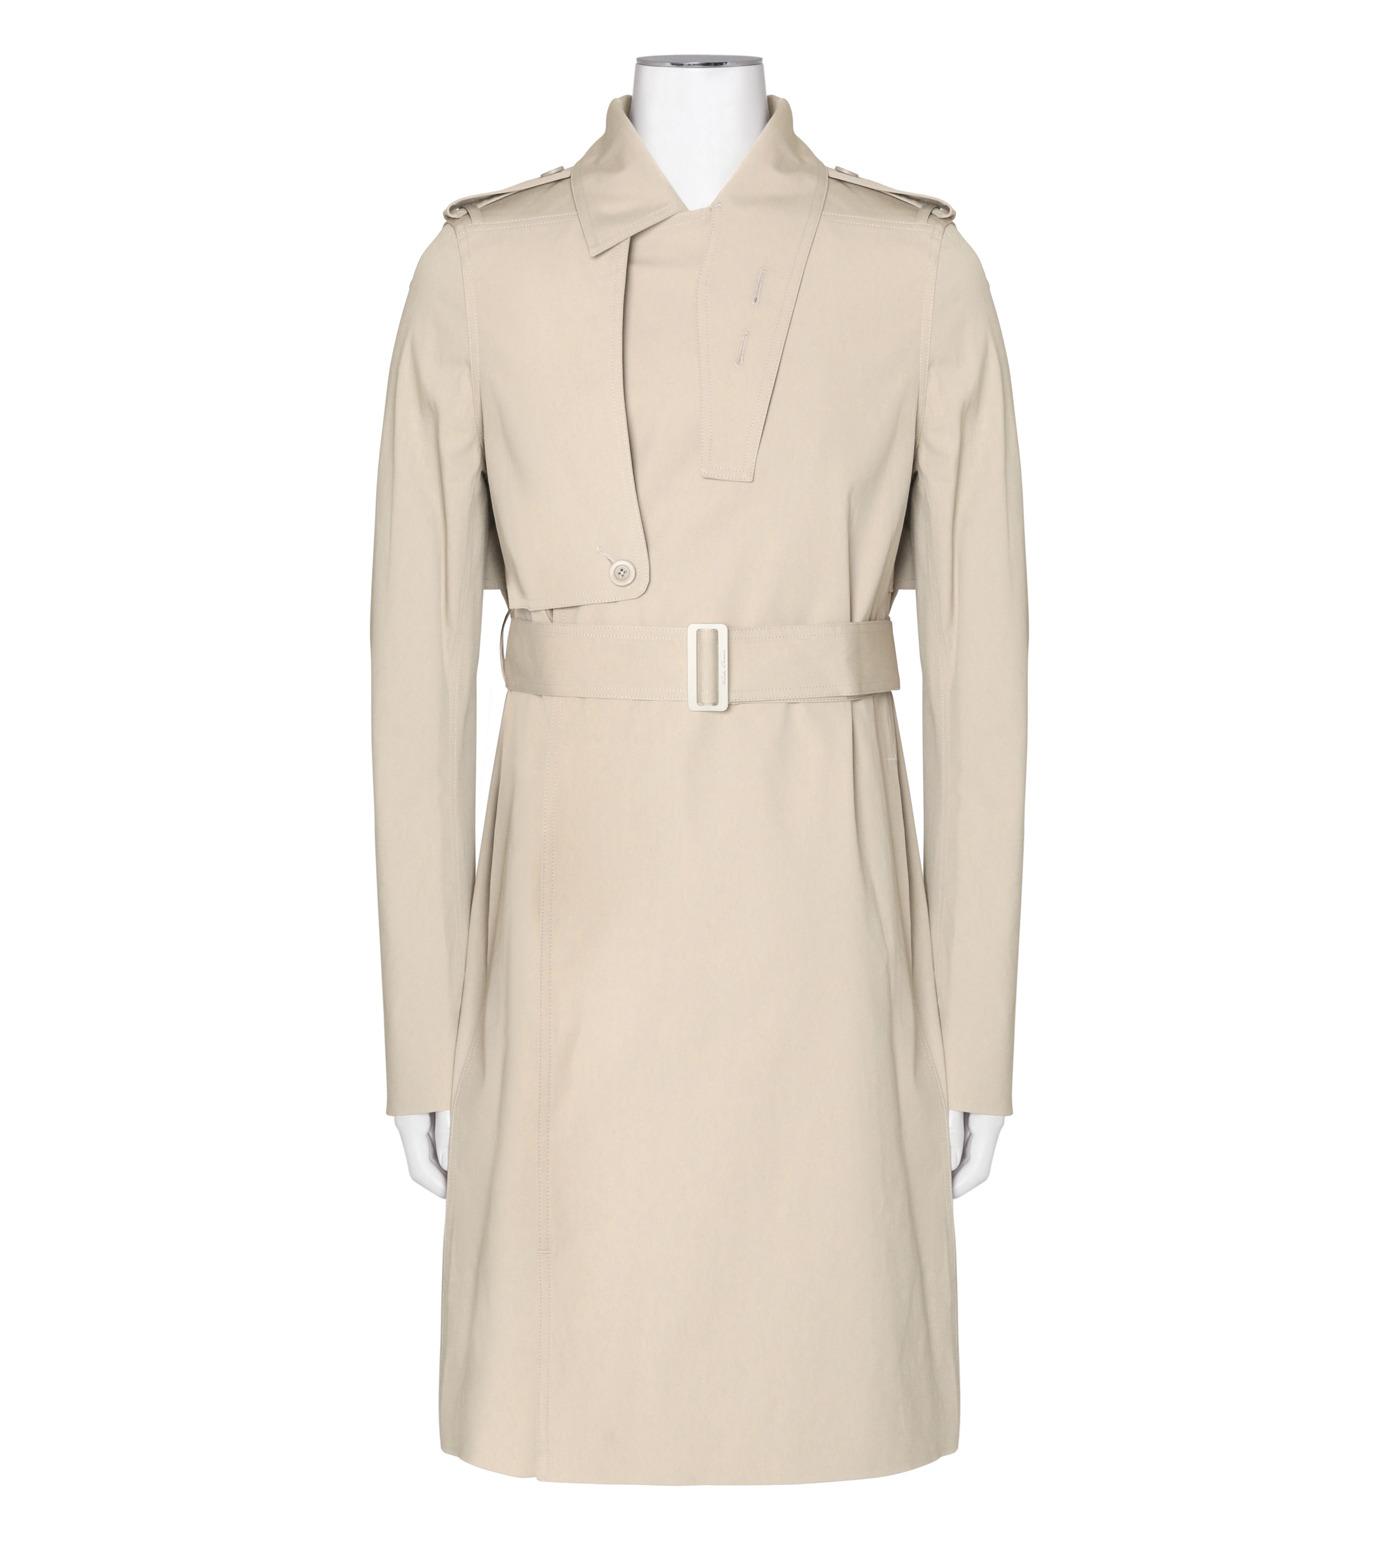 Rick Owens(リックオウエンス)のTrench Coat-GRAY(コート/coat)-RR16F6708TE-11 拡大詳細画像1